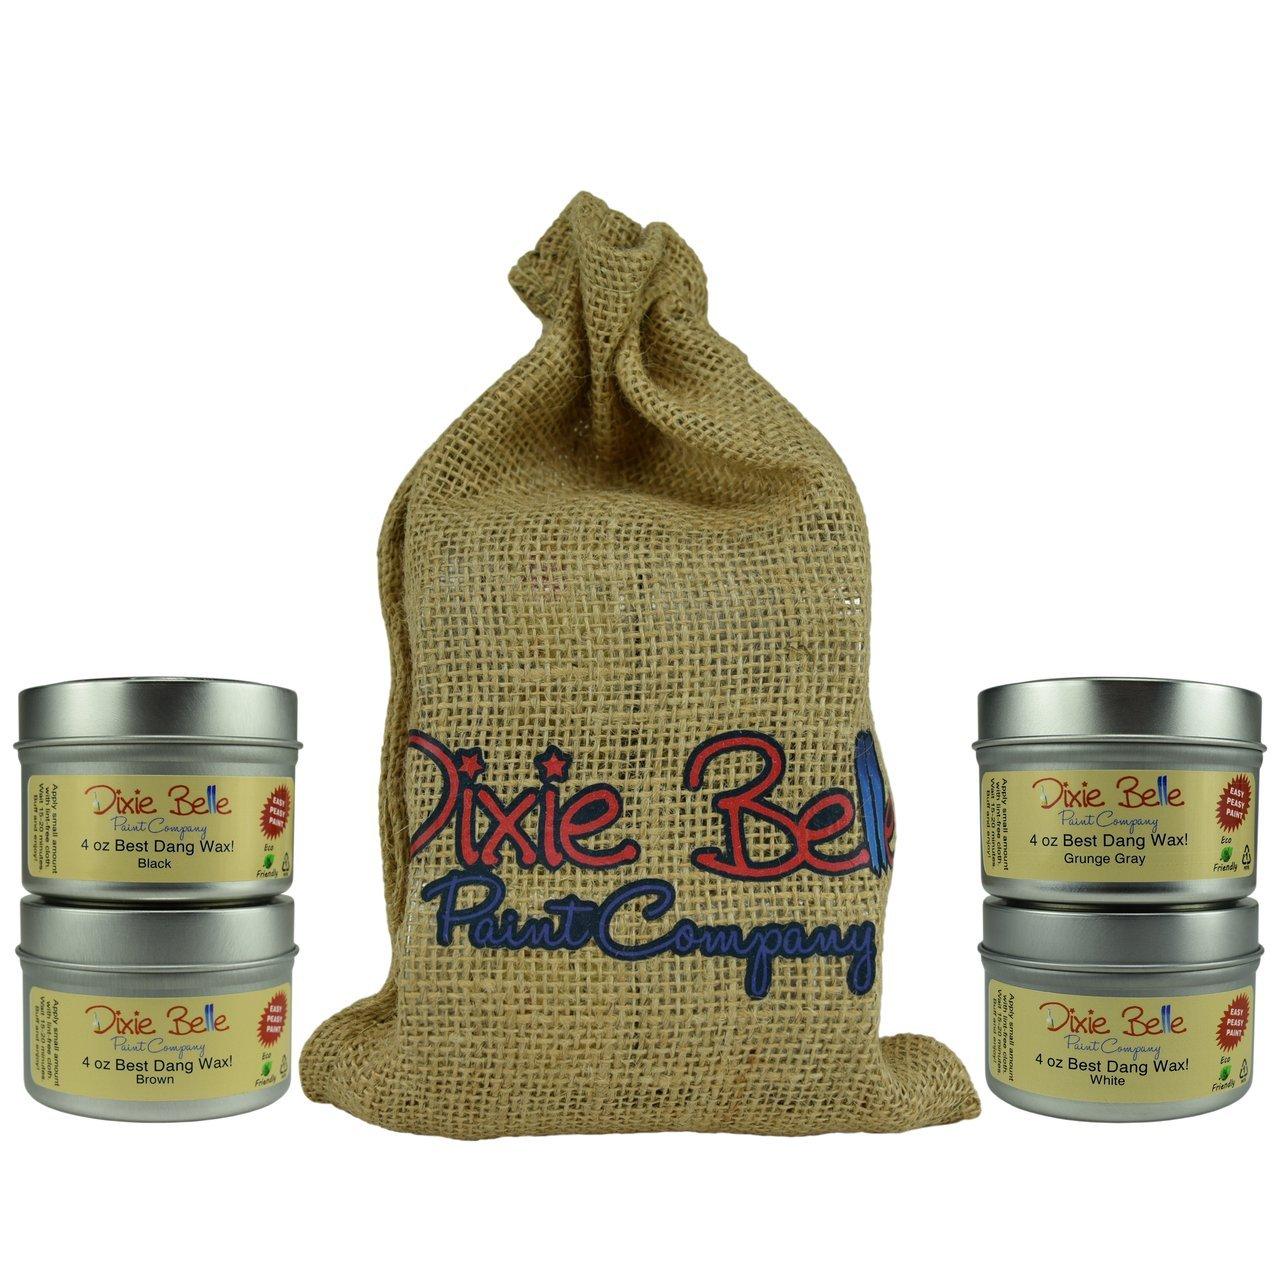 Dixie Belle Paint Company Sack O' Wax by Dixie Belle Paint Company